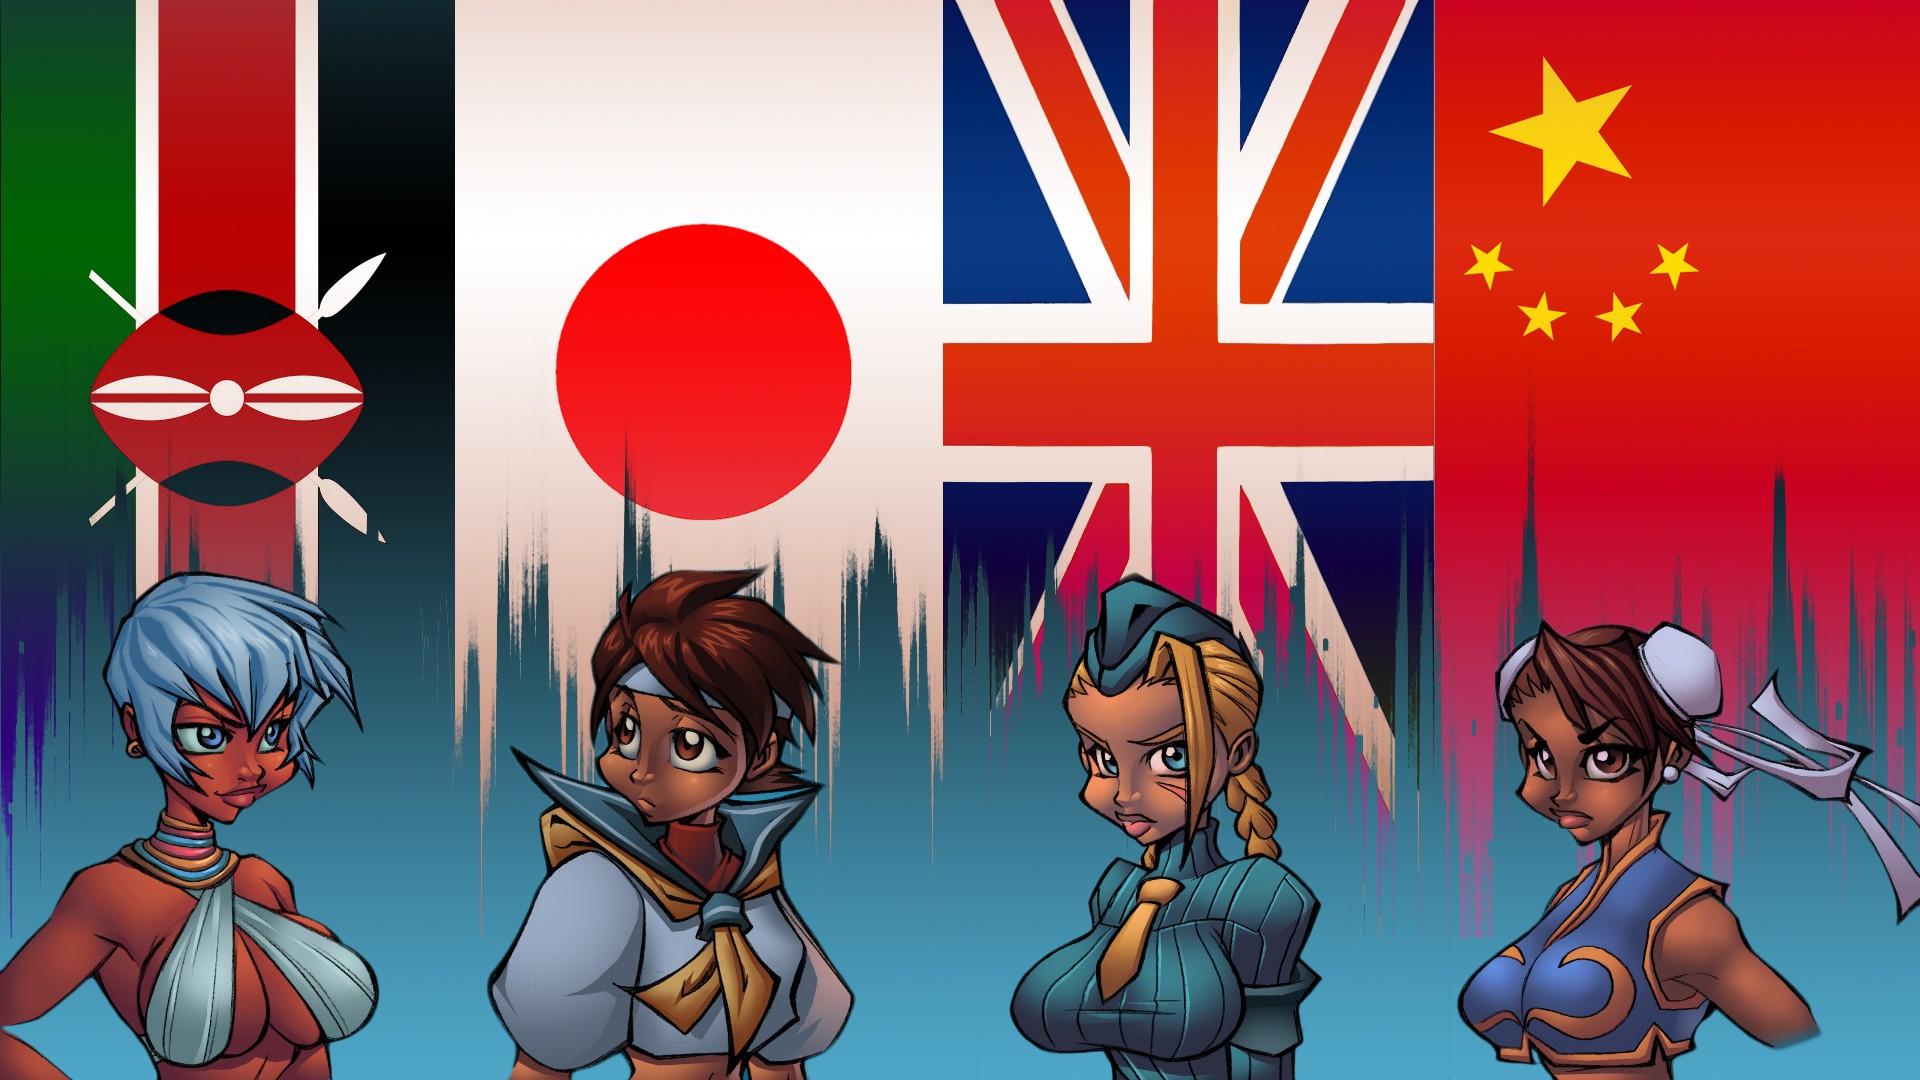 wallpaper : illustration, video games, anime, cartoon, flag, street